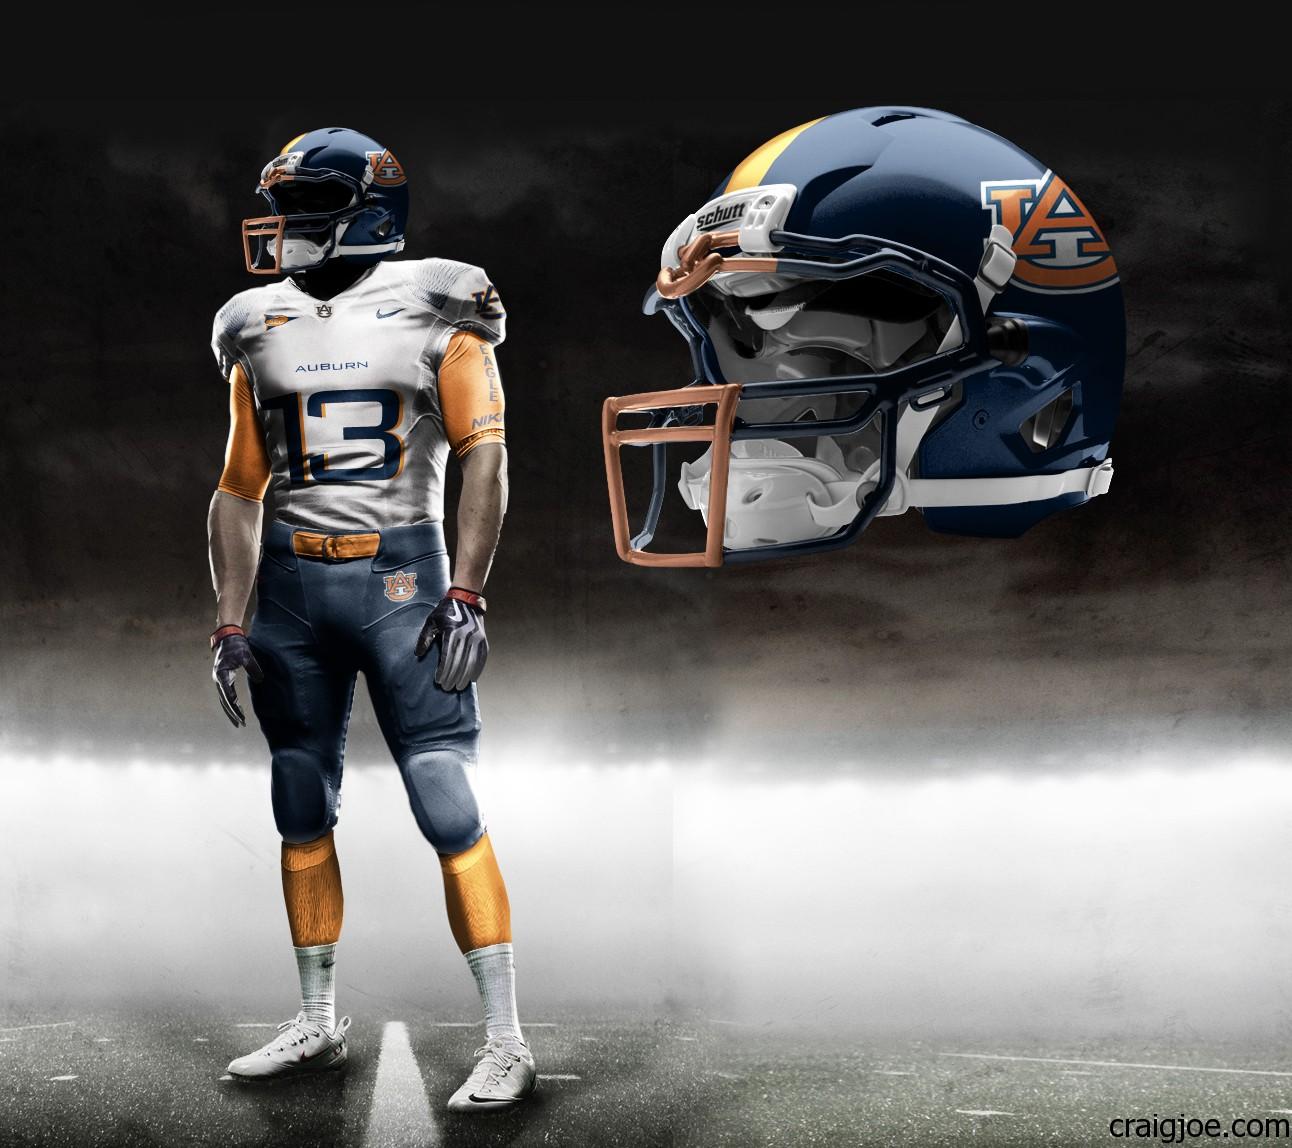 nike air max respirer la chaussure de cage hommes - What If Auburn Had Nike Pro Combat Uniforms?